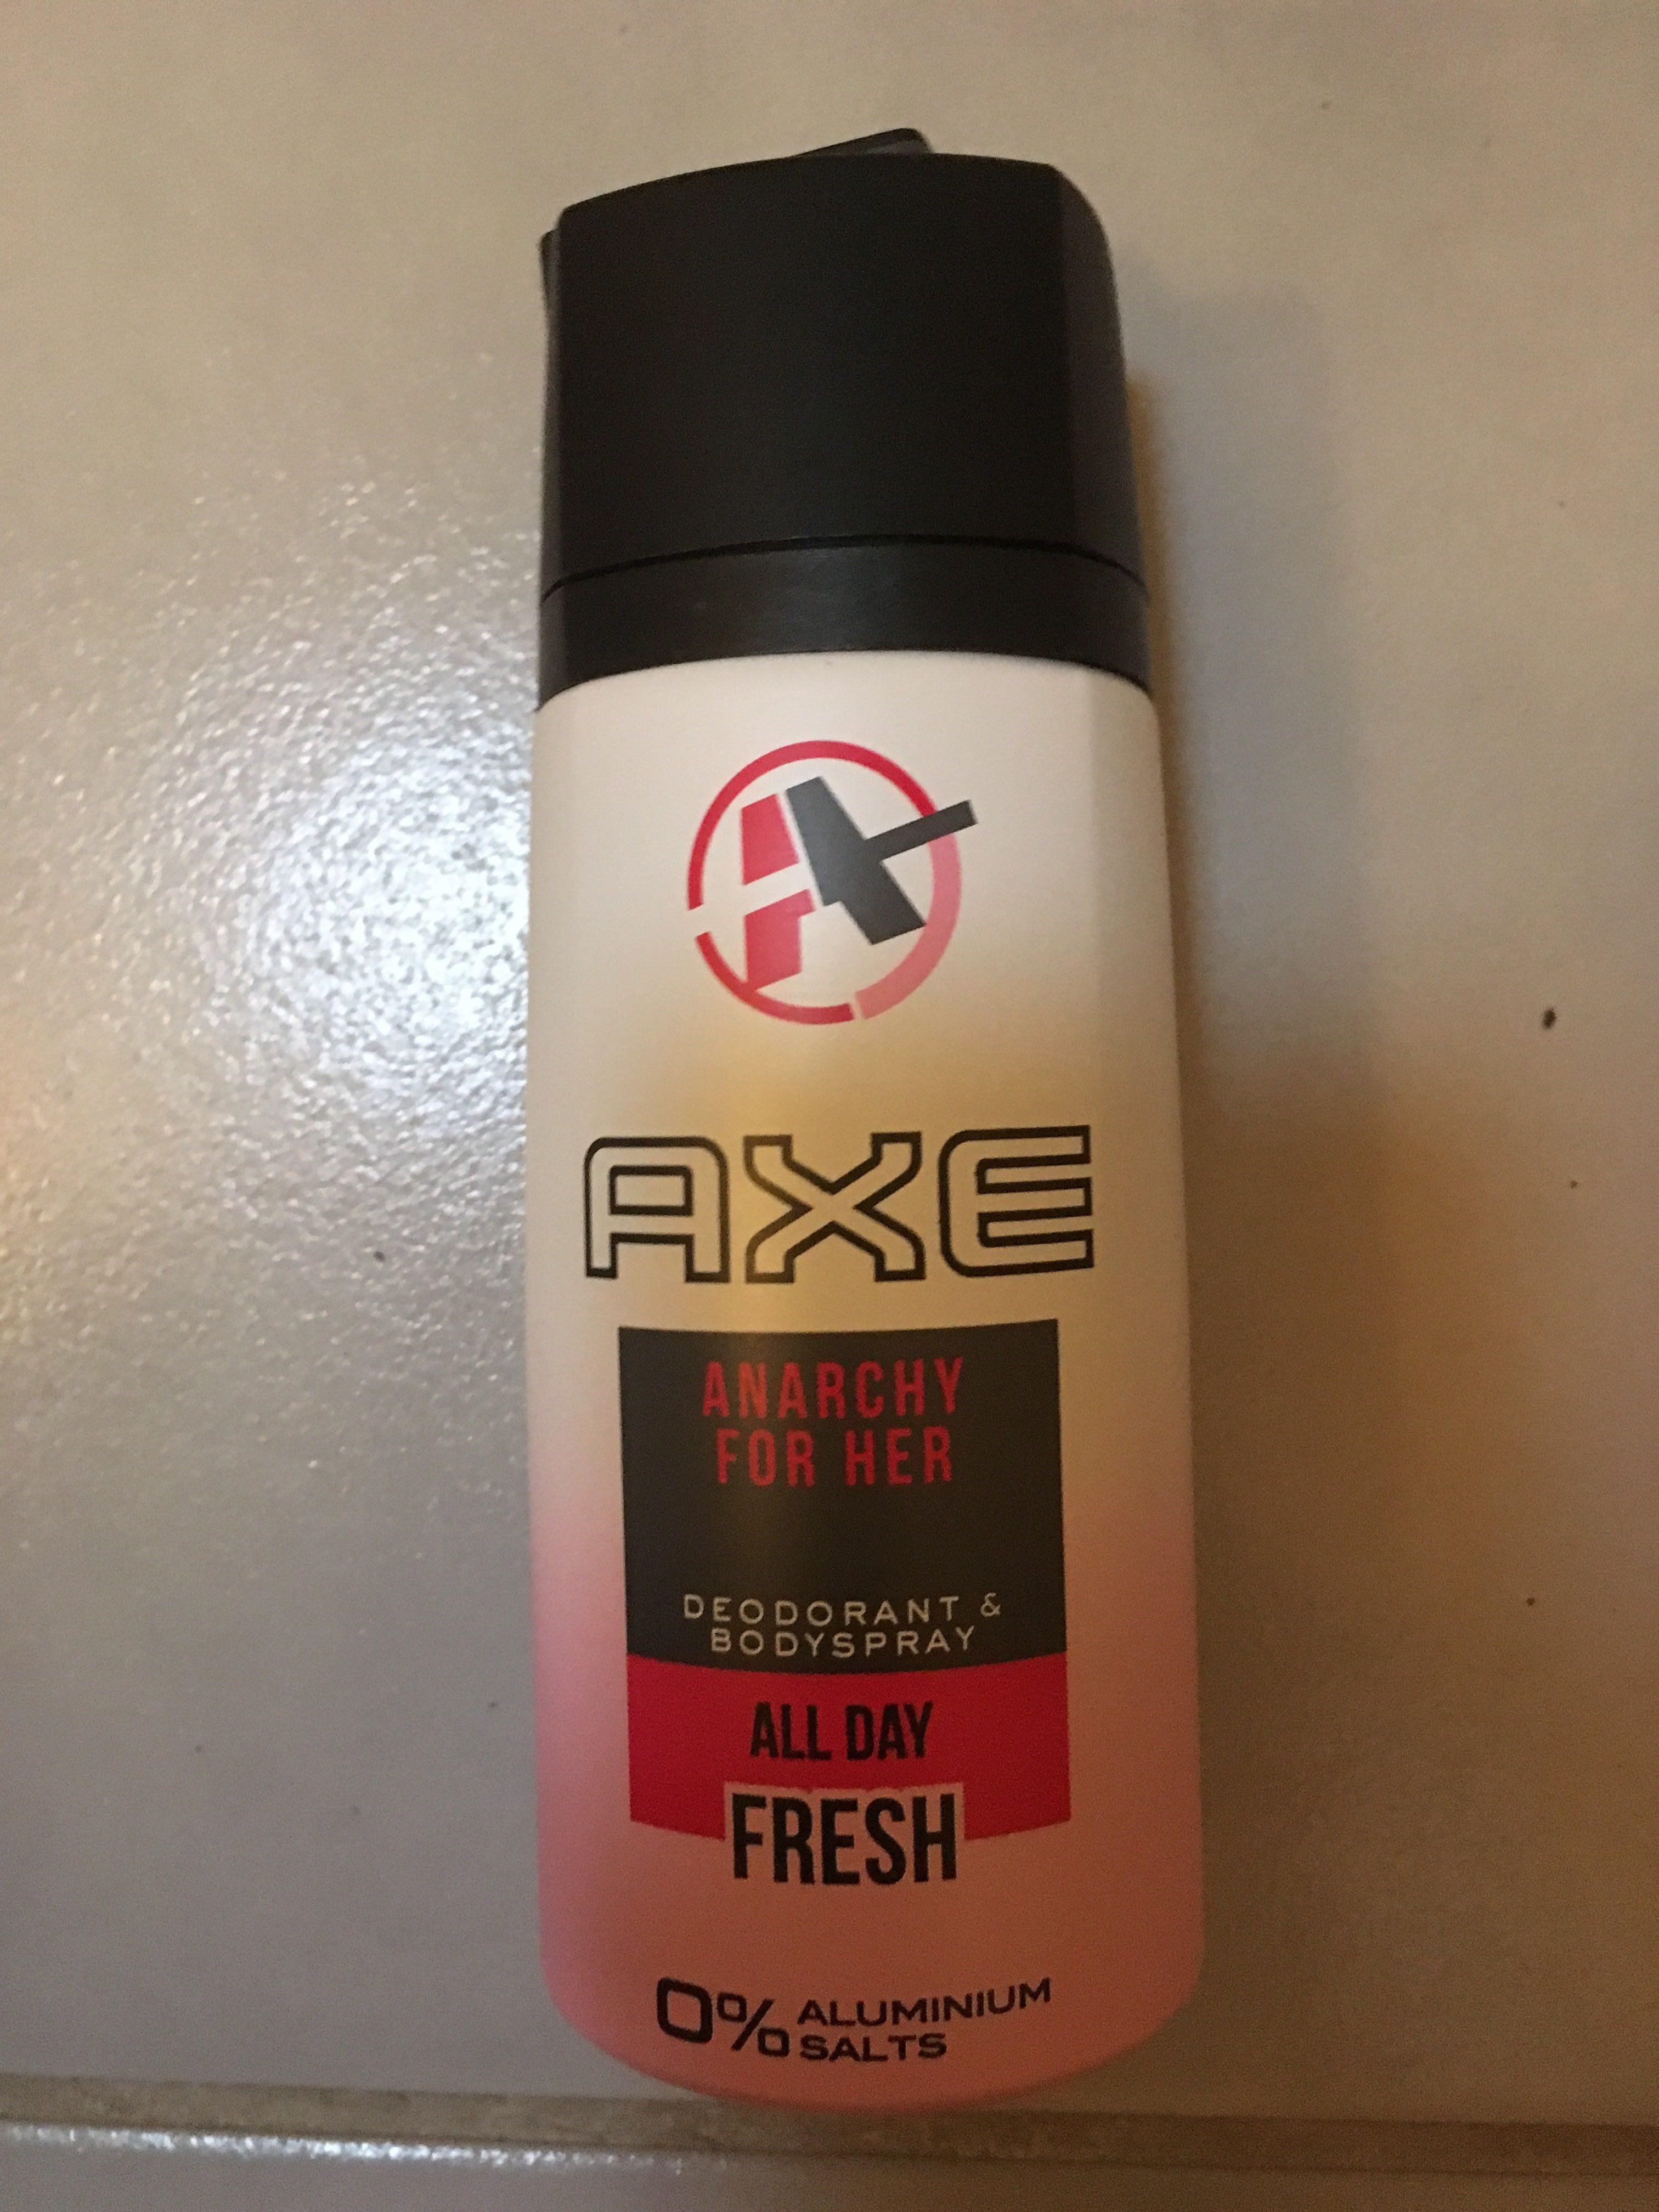 Anarchy for her, deodorant & bodyspray - Product - fr